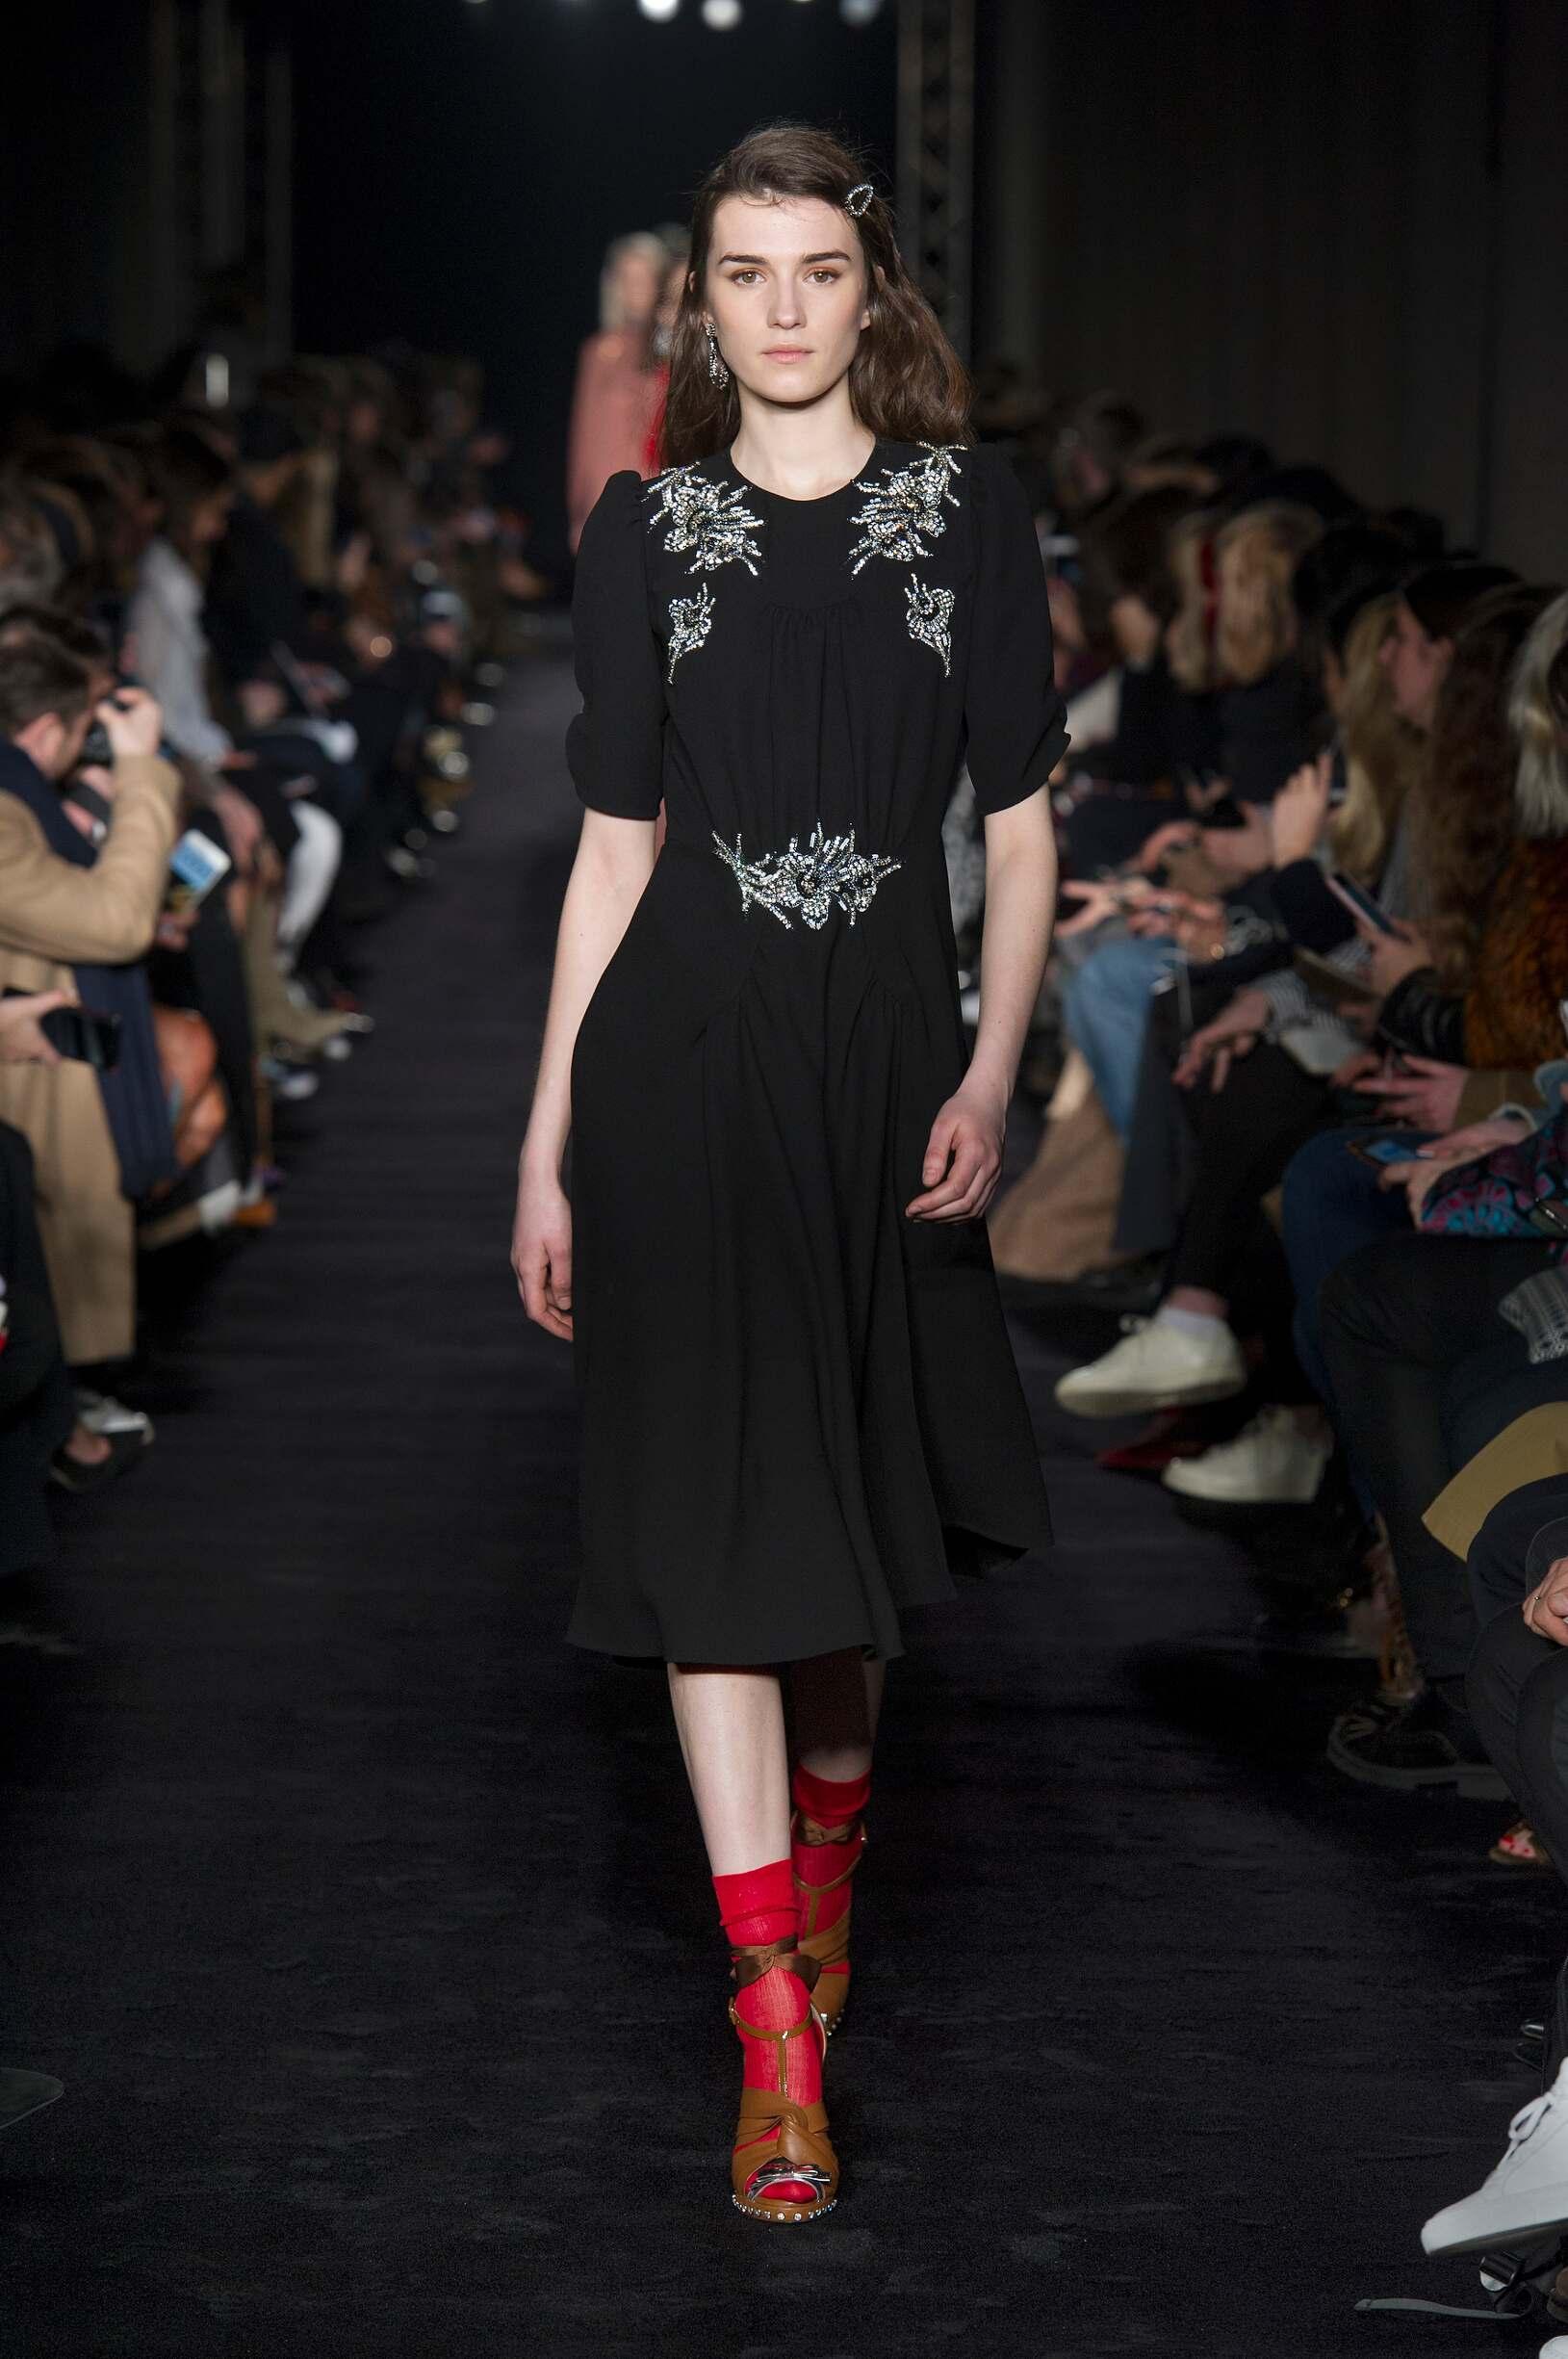 N°21 Fall Winter 2017 Womens Collection Milan Fashion Week